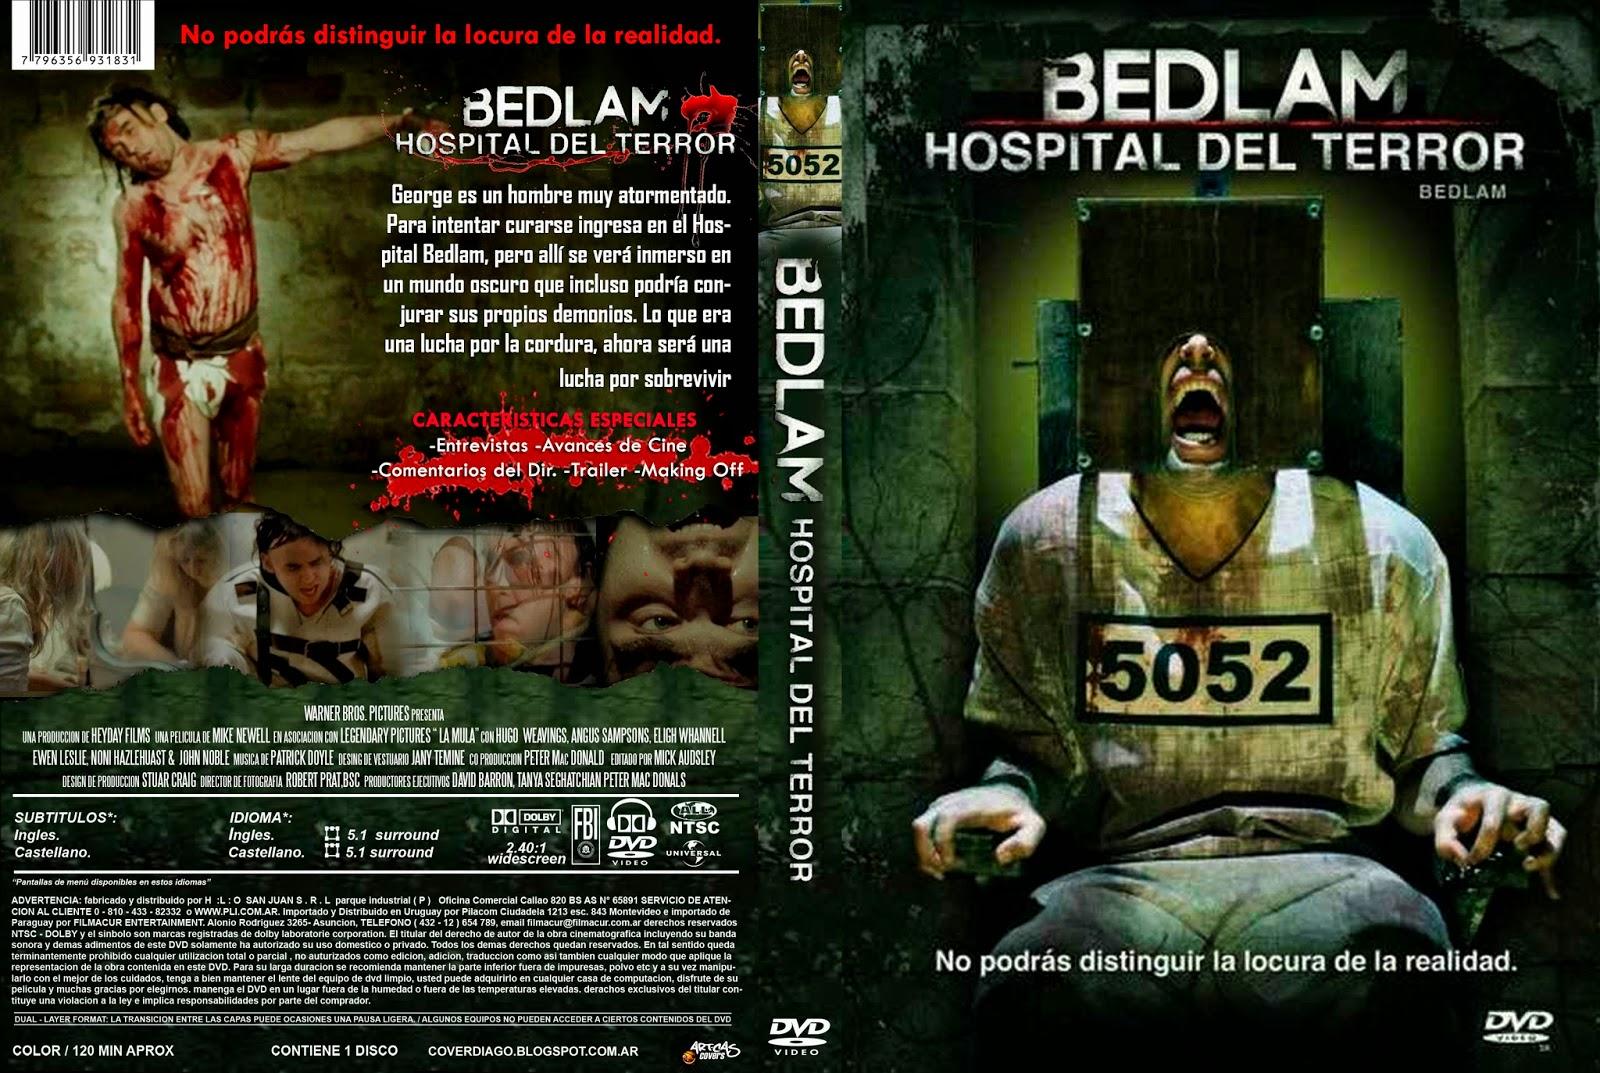 http://1.bp.blogspot.com/-dNkLPcBLNkI/VT2lJnR2ZUI/AAAAAAAADg4/H9KXLJeNg-c/s1600/BEDLAM_Hospital%2Bdel%2Bterror_COVER.jpg